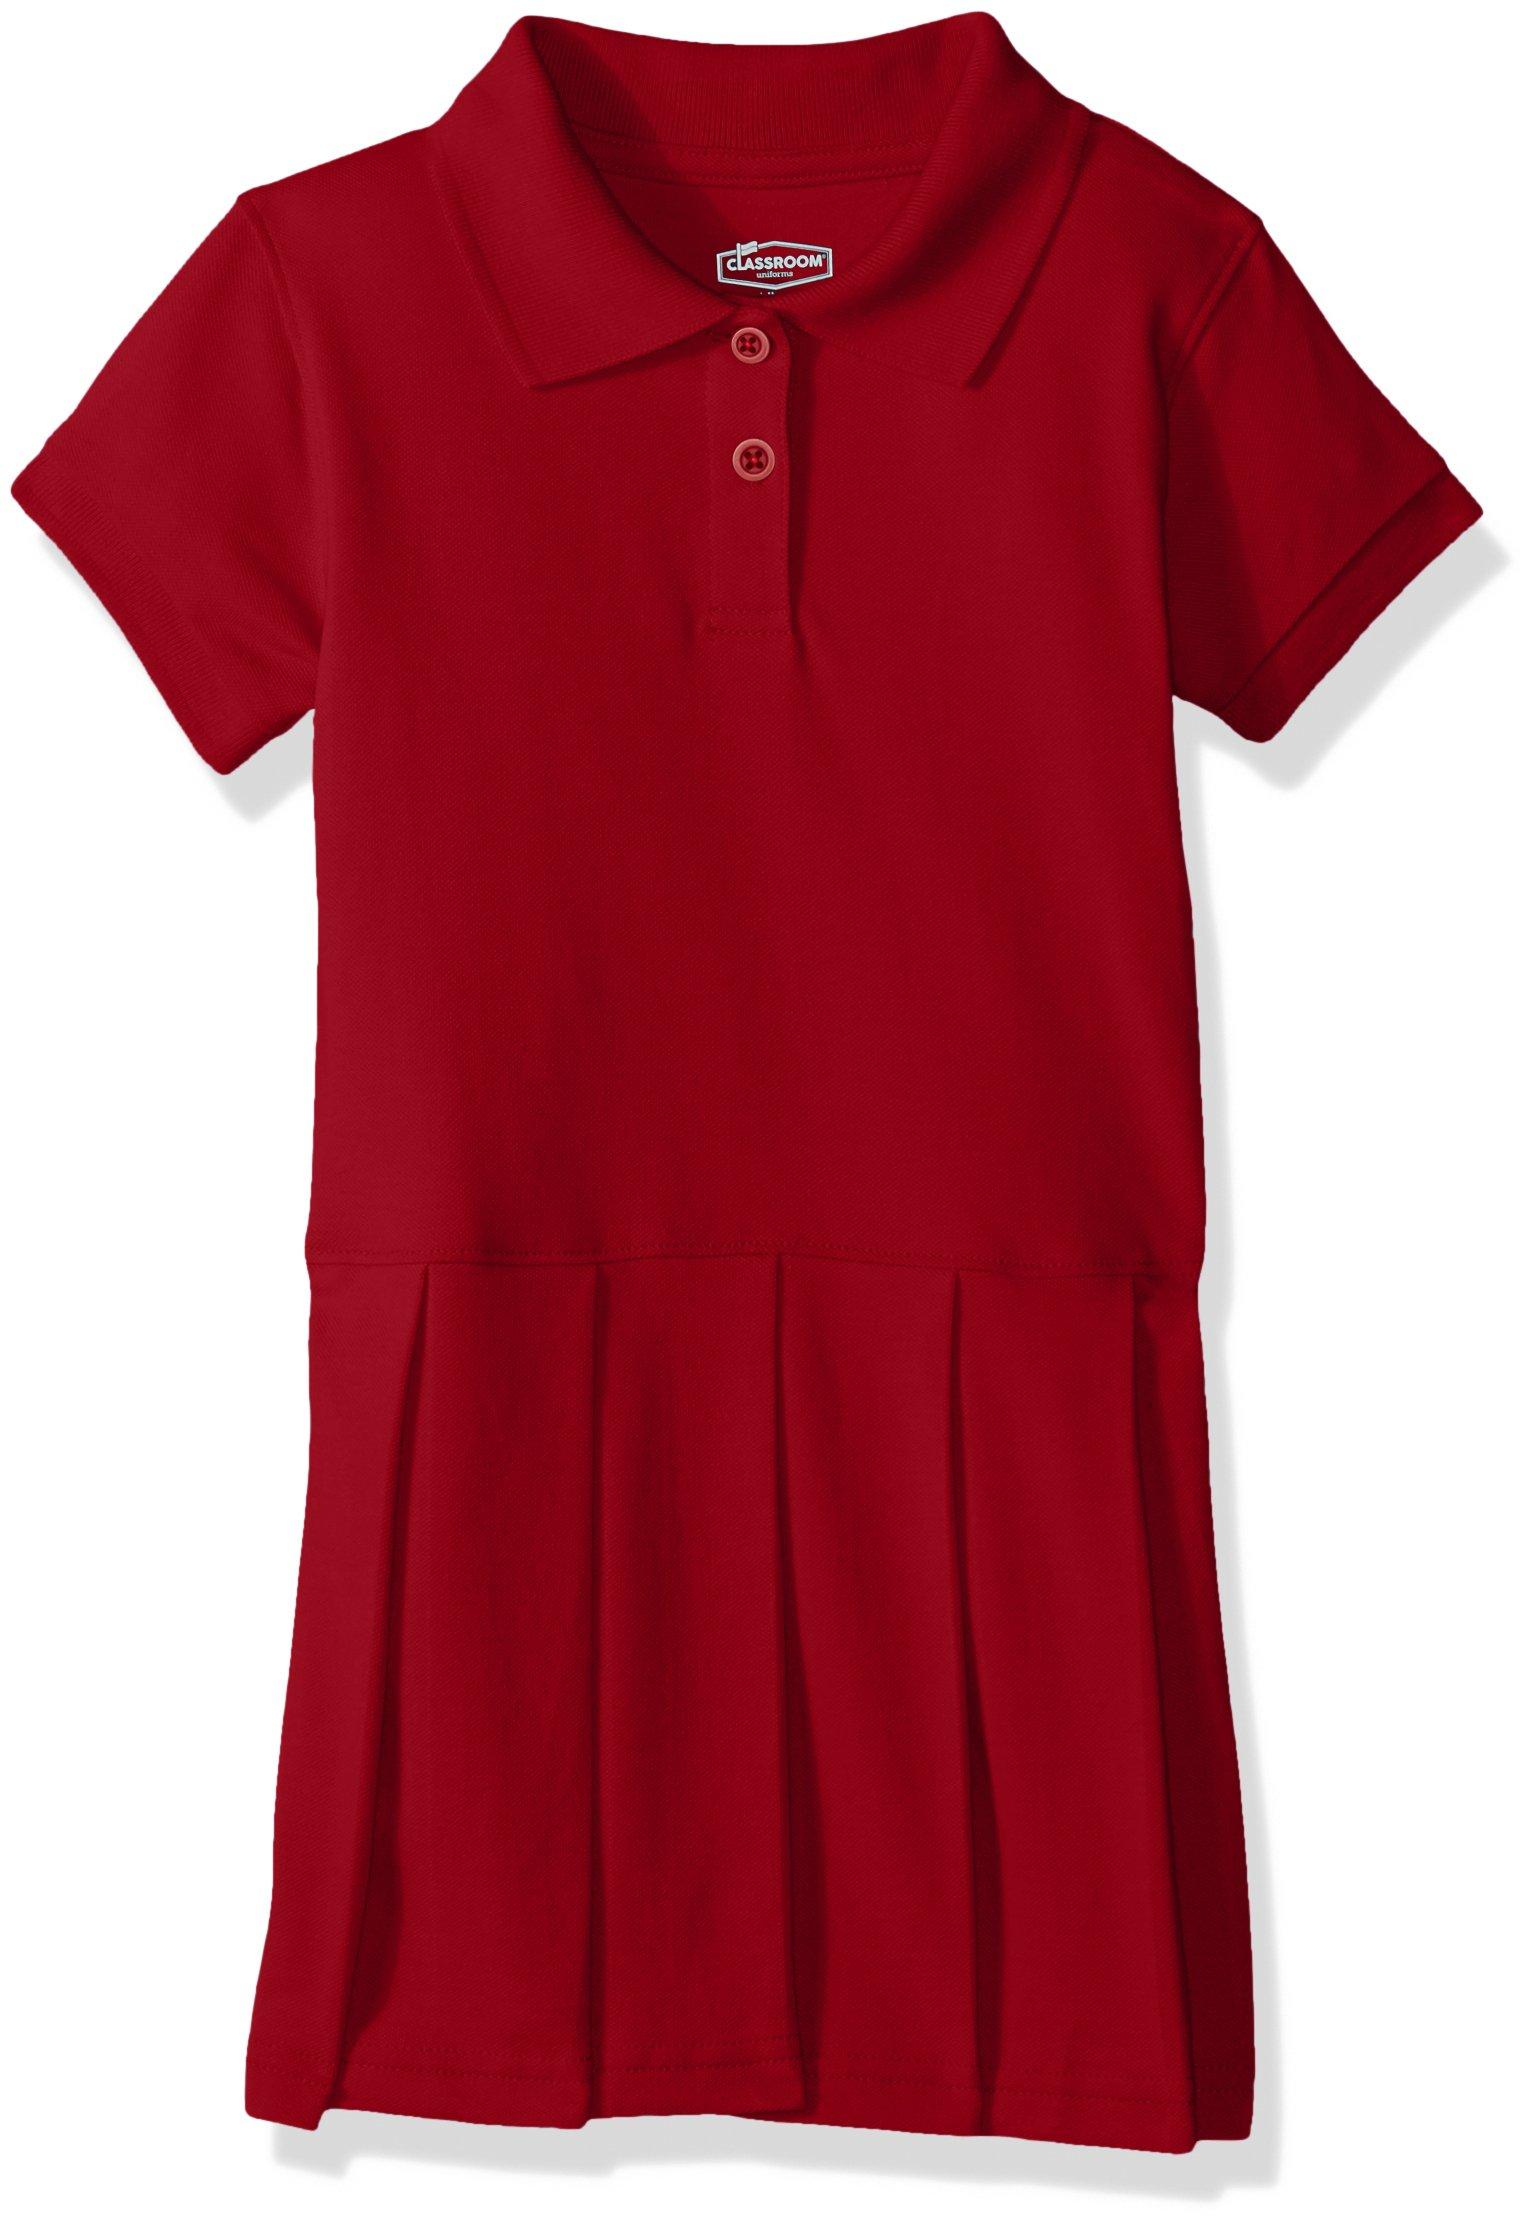 8f2ffb320b203 Galleon - Classroom School Uniforms Girls' Big Pique Polo Dress, Red M